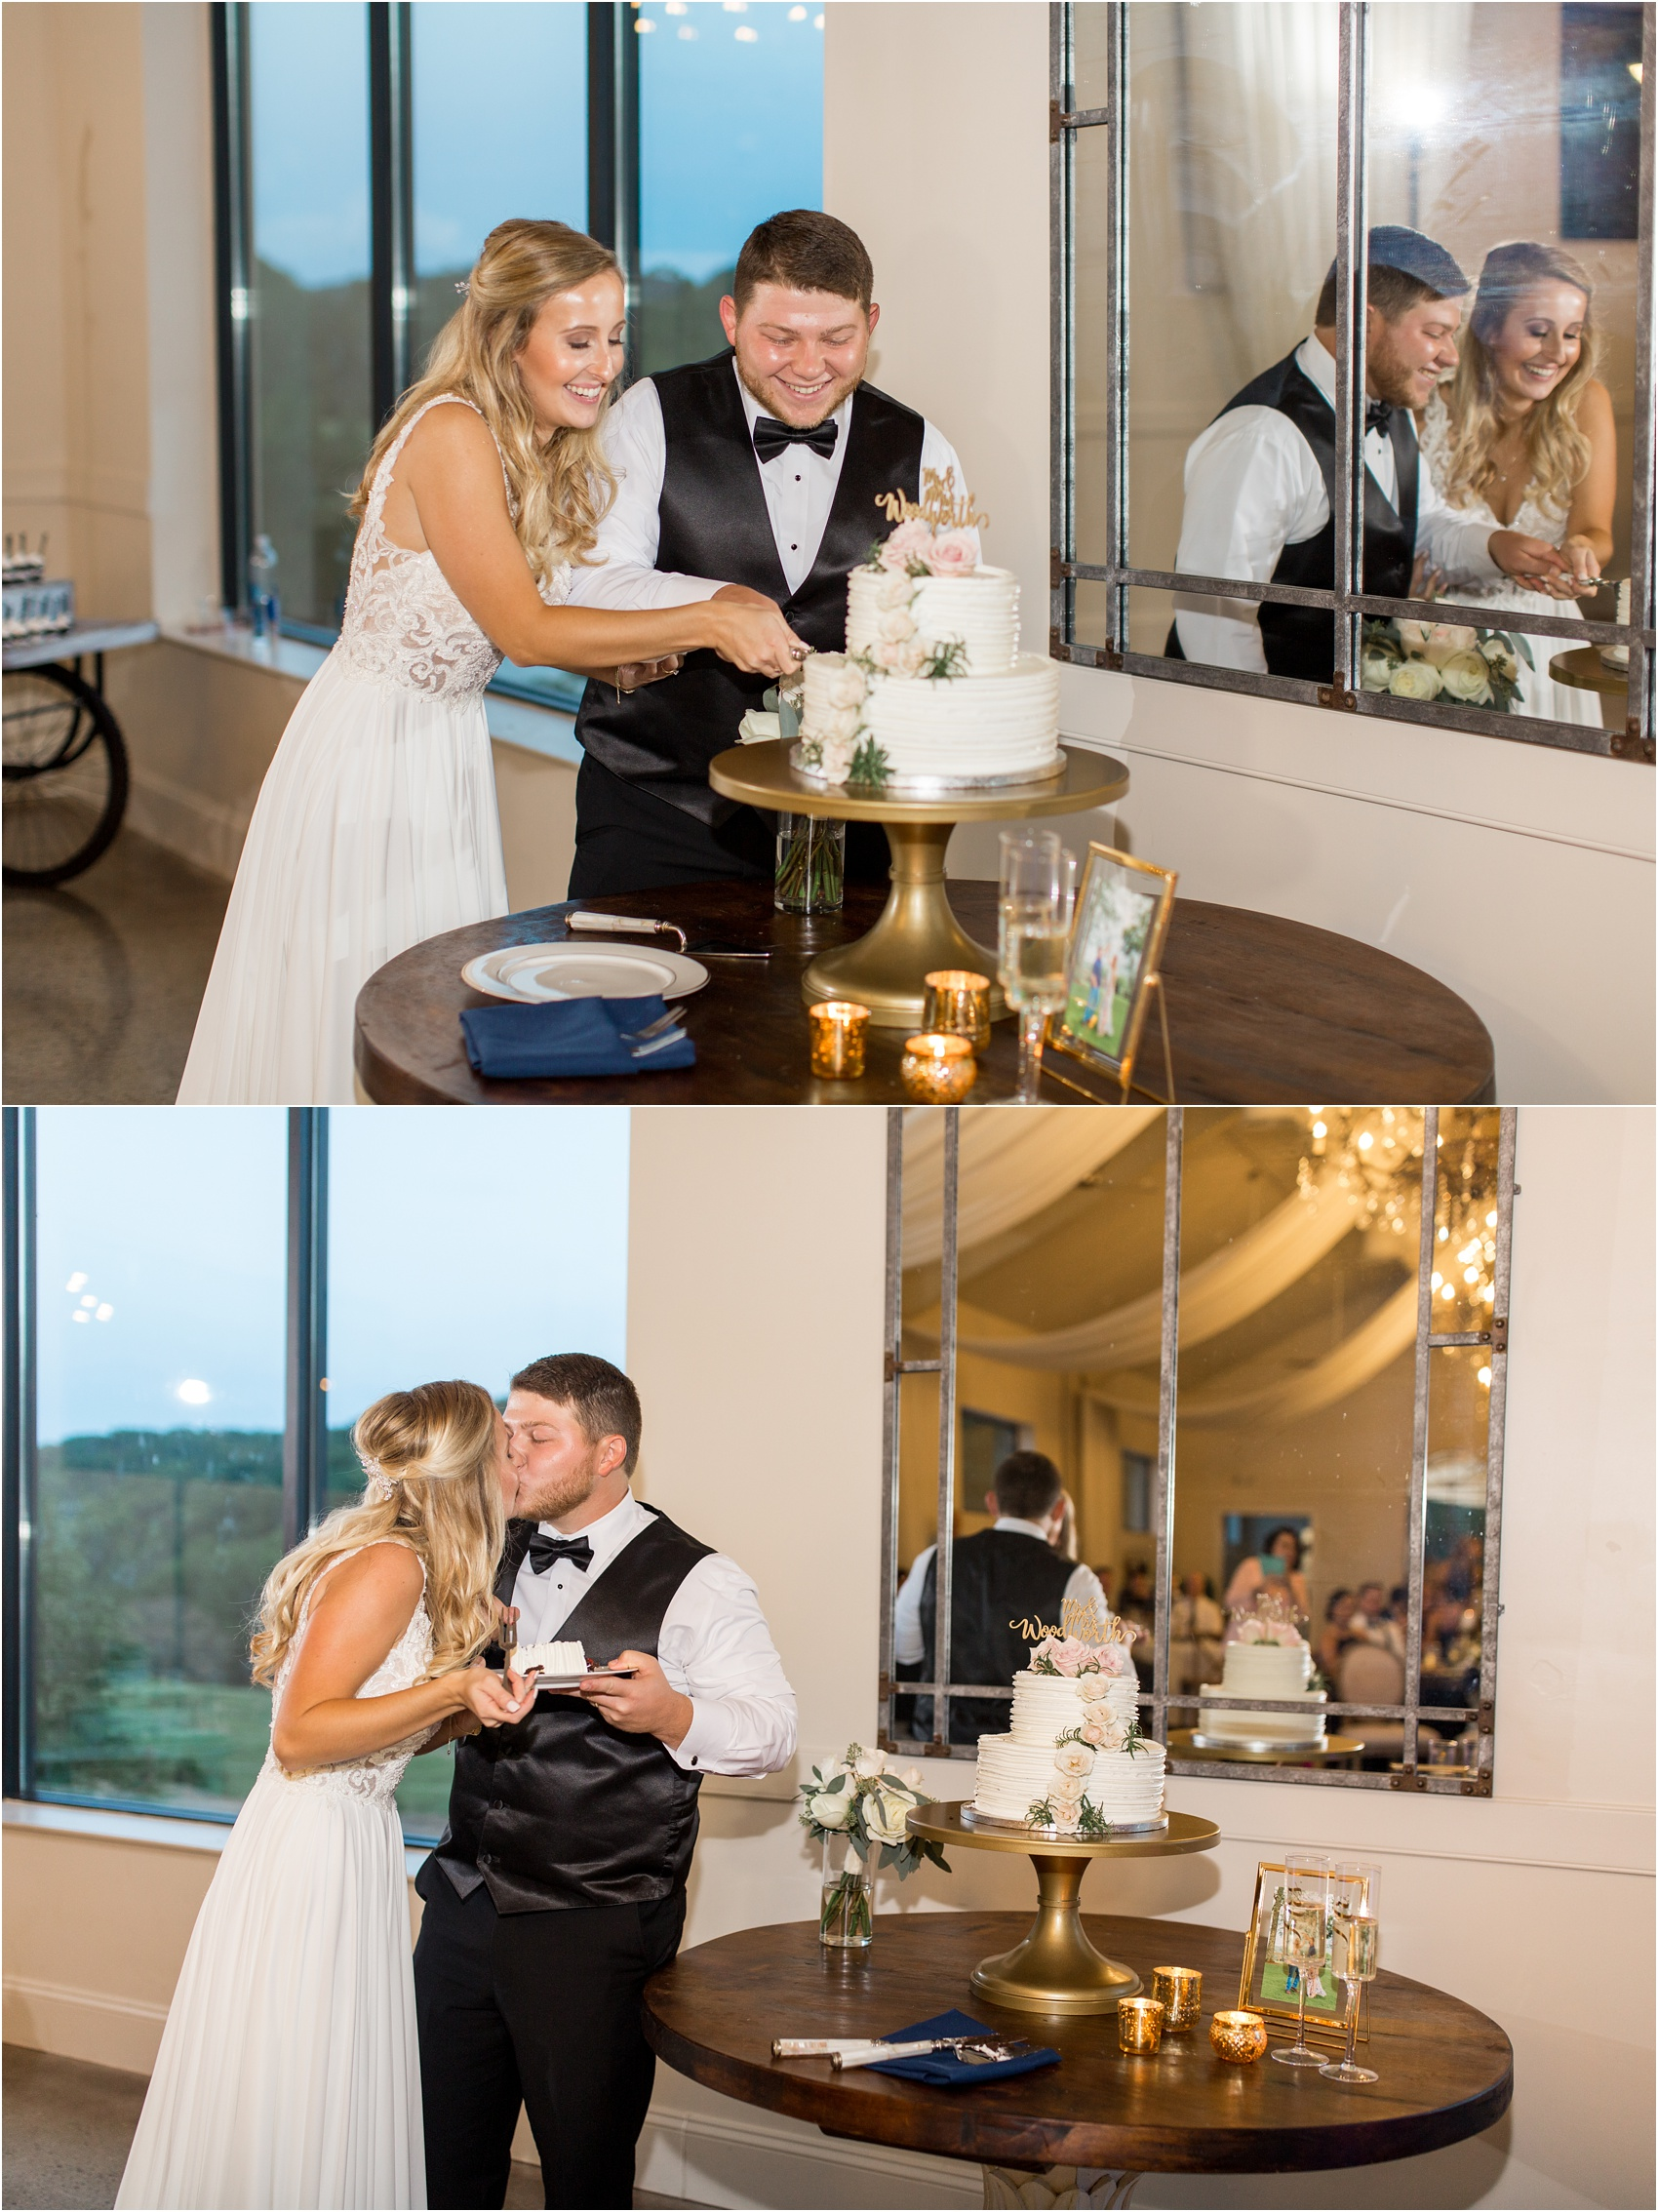 Savannah Eve Photography- Jurek-Woodworth Wedding- Sneak Peek-86.jpg